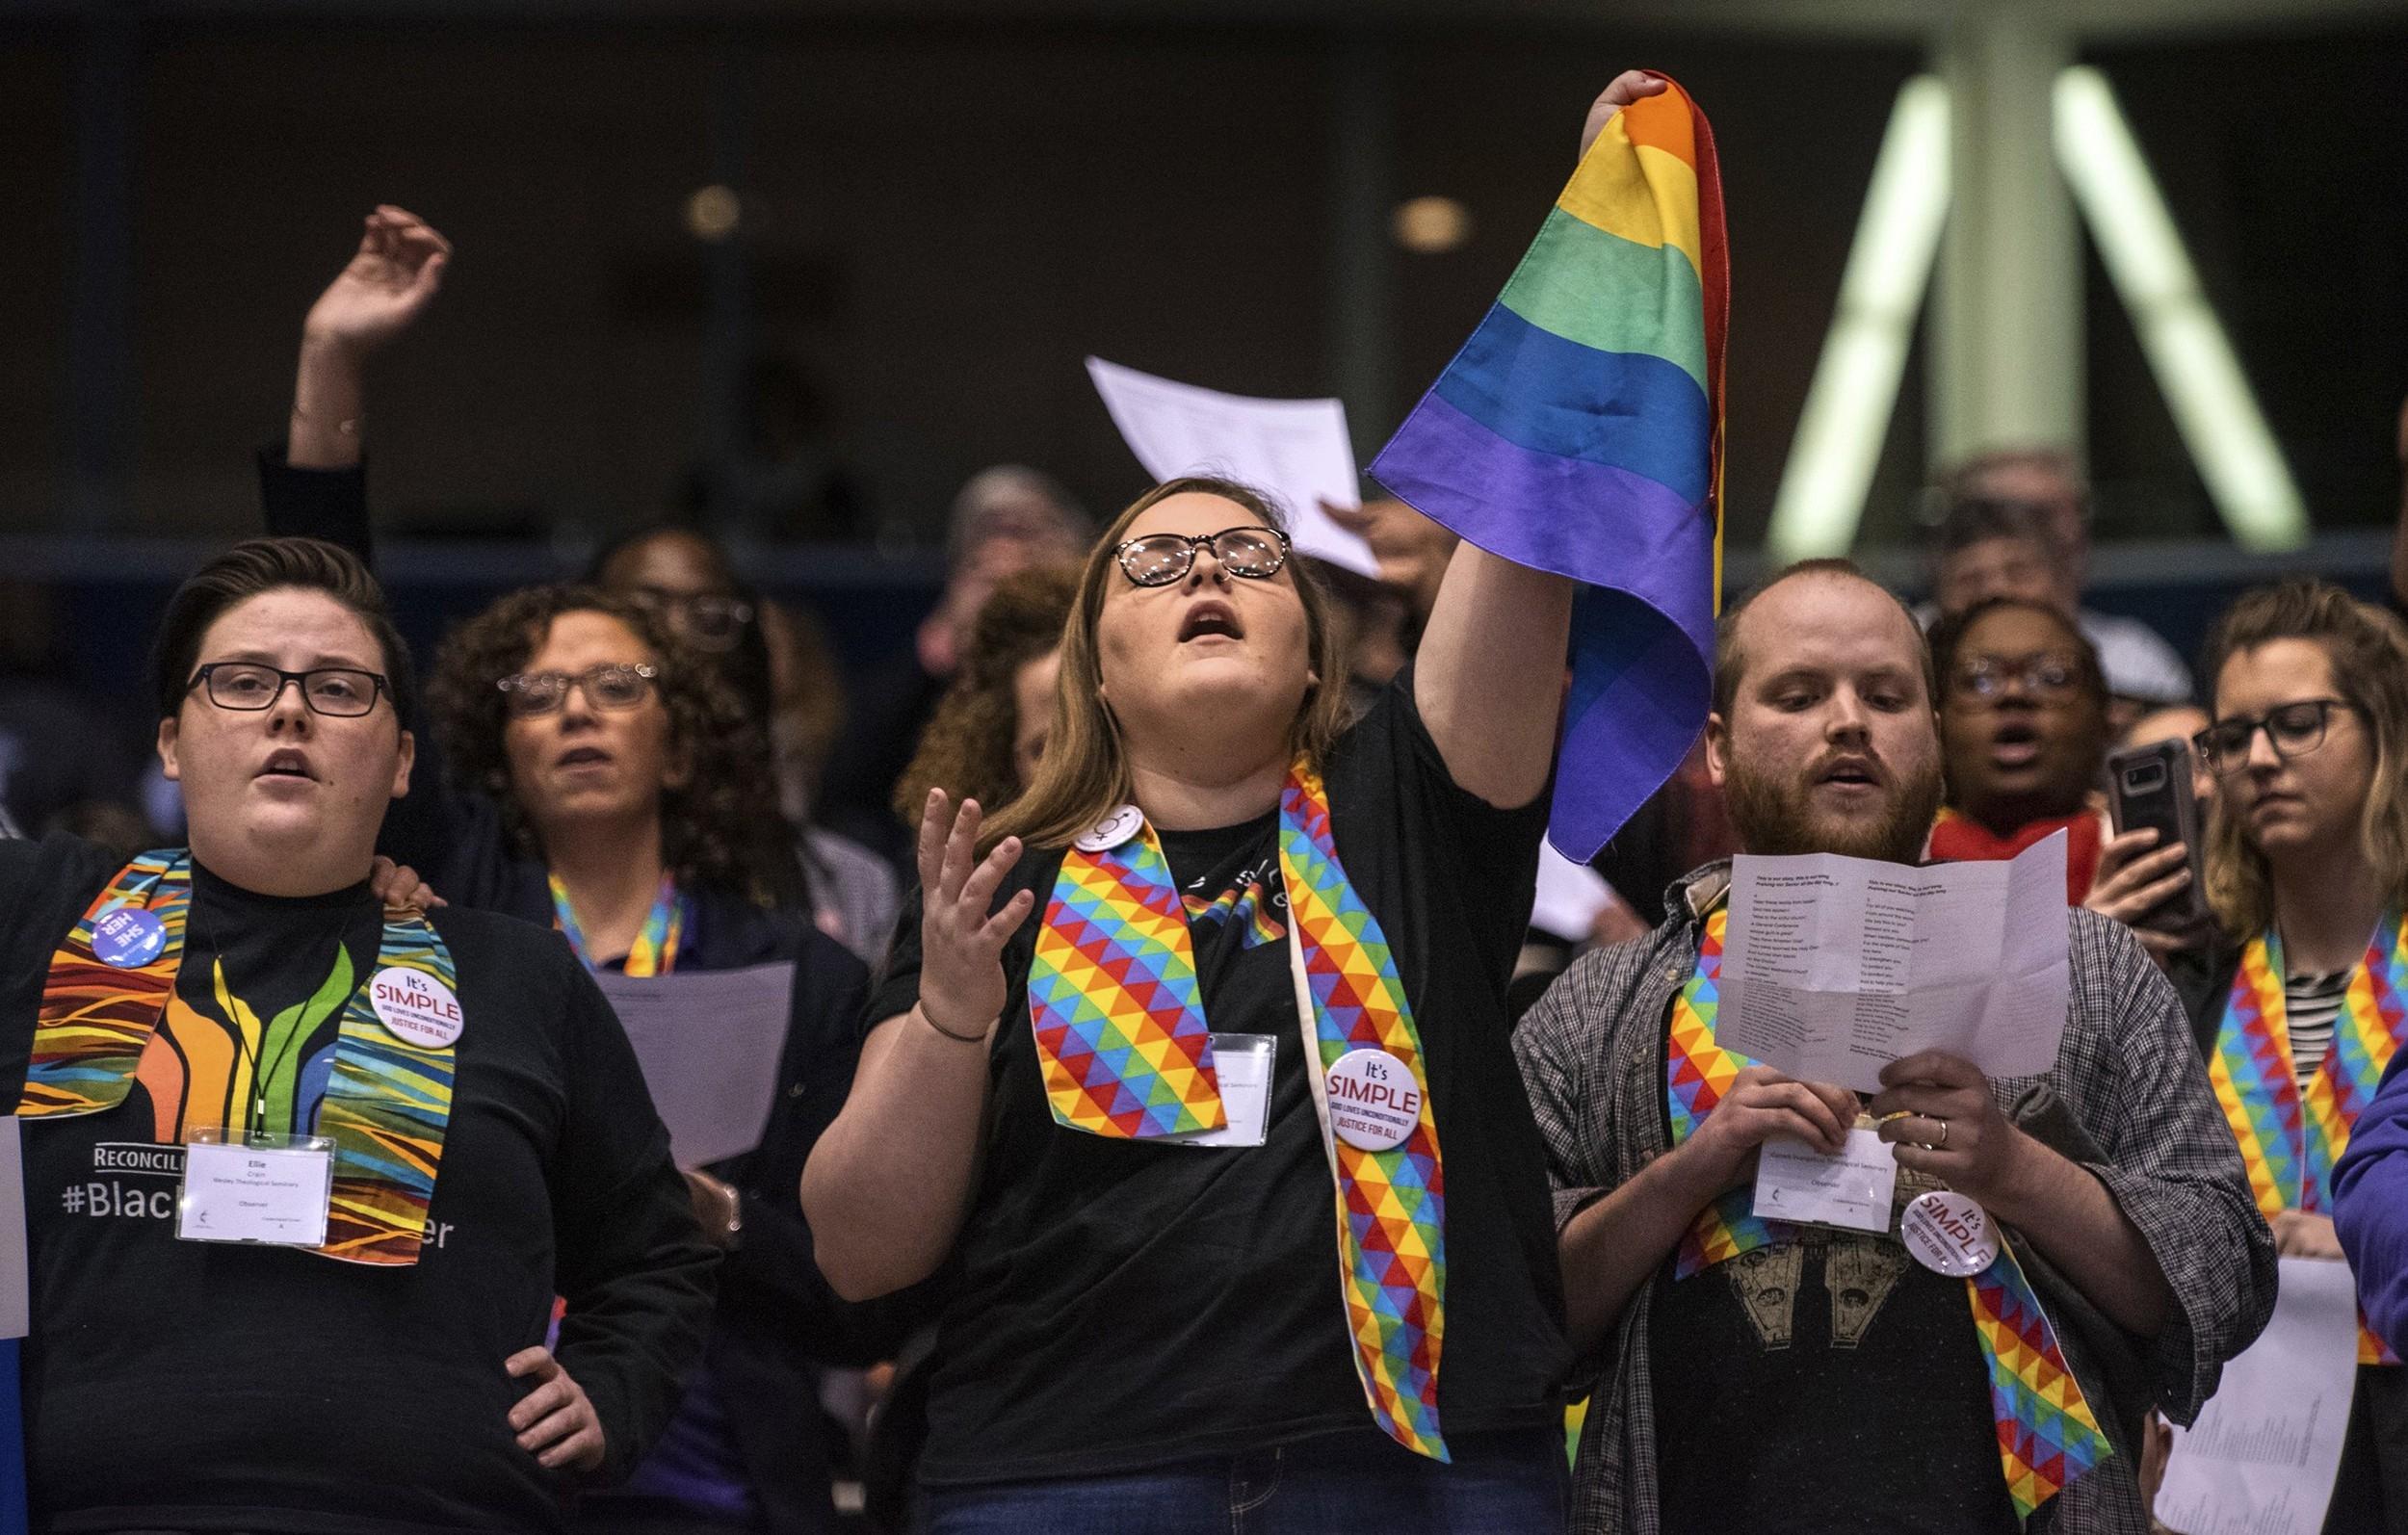 United Methodist Church Looks To Split Over Lgbtq Issues  United Methodist Churches